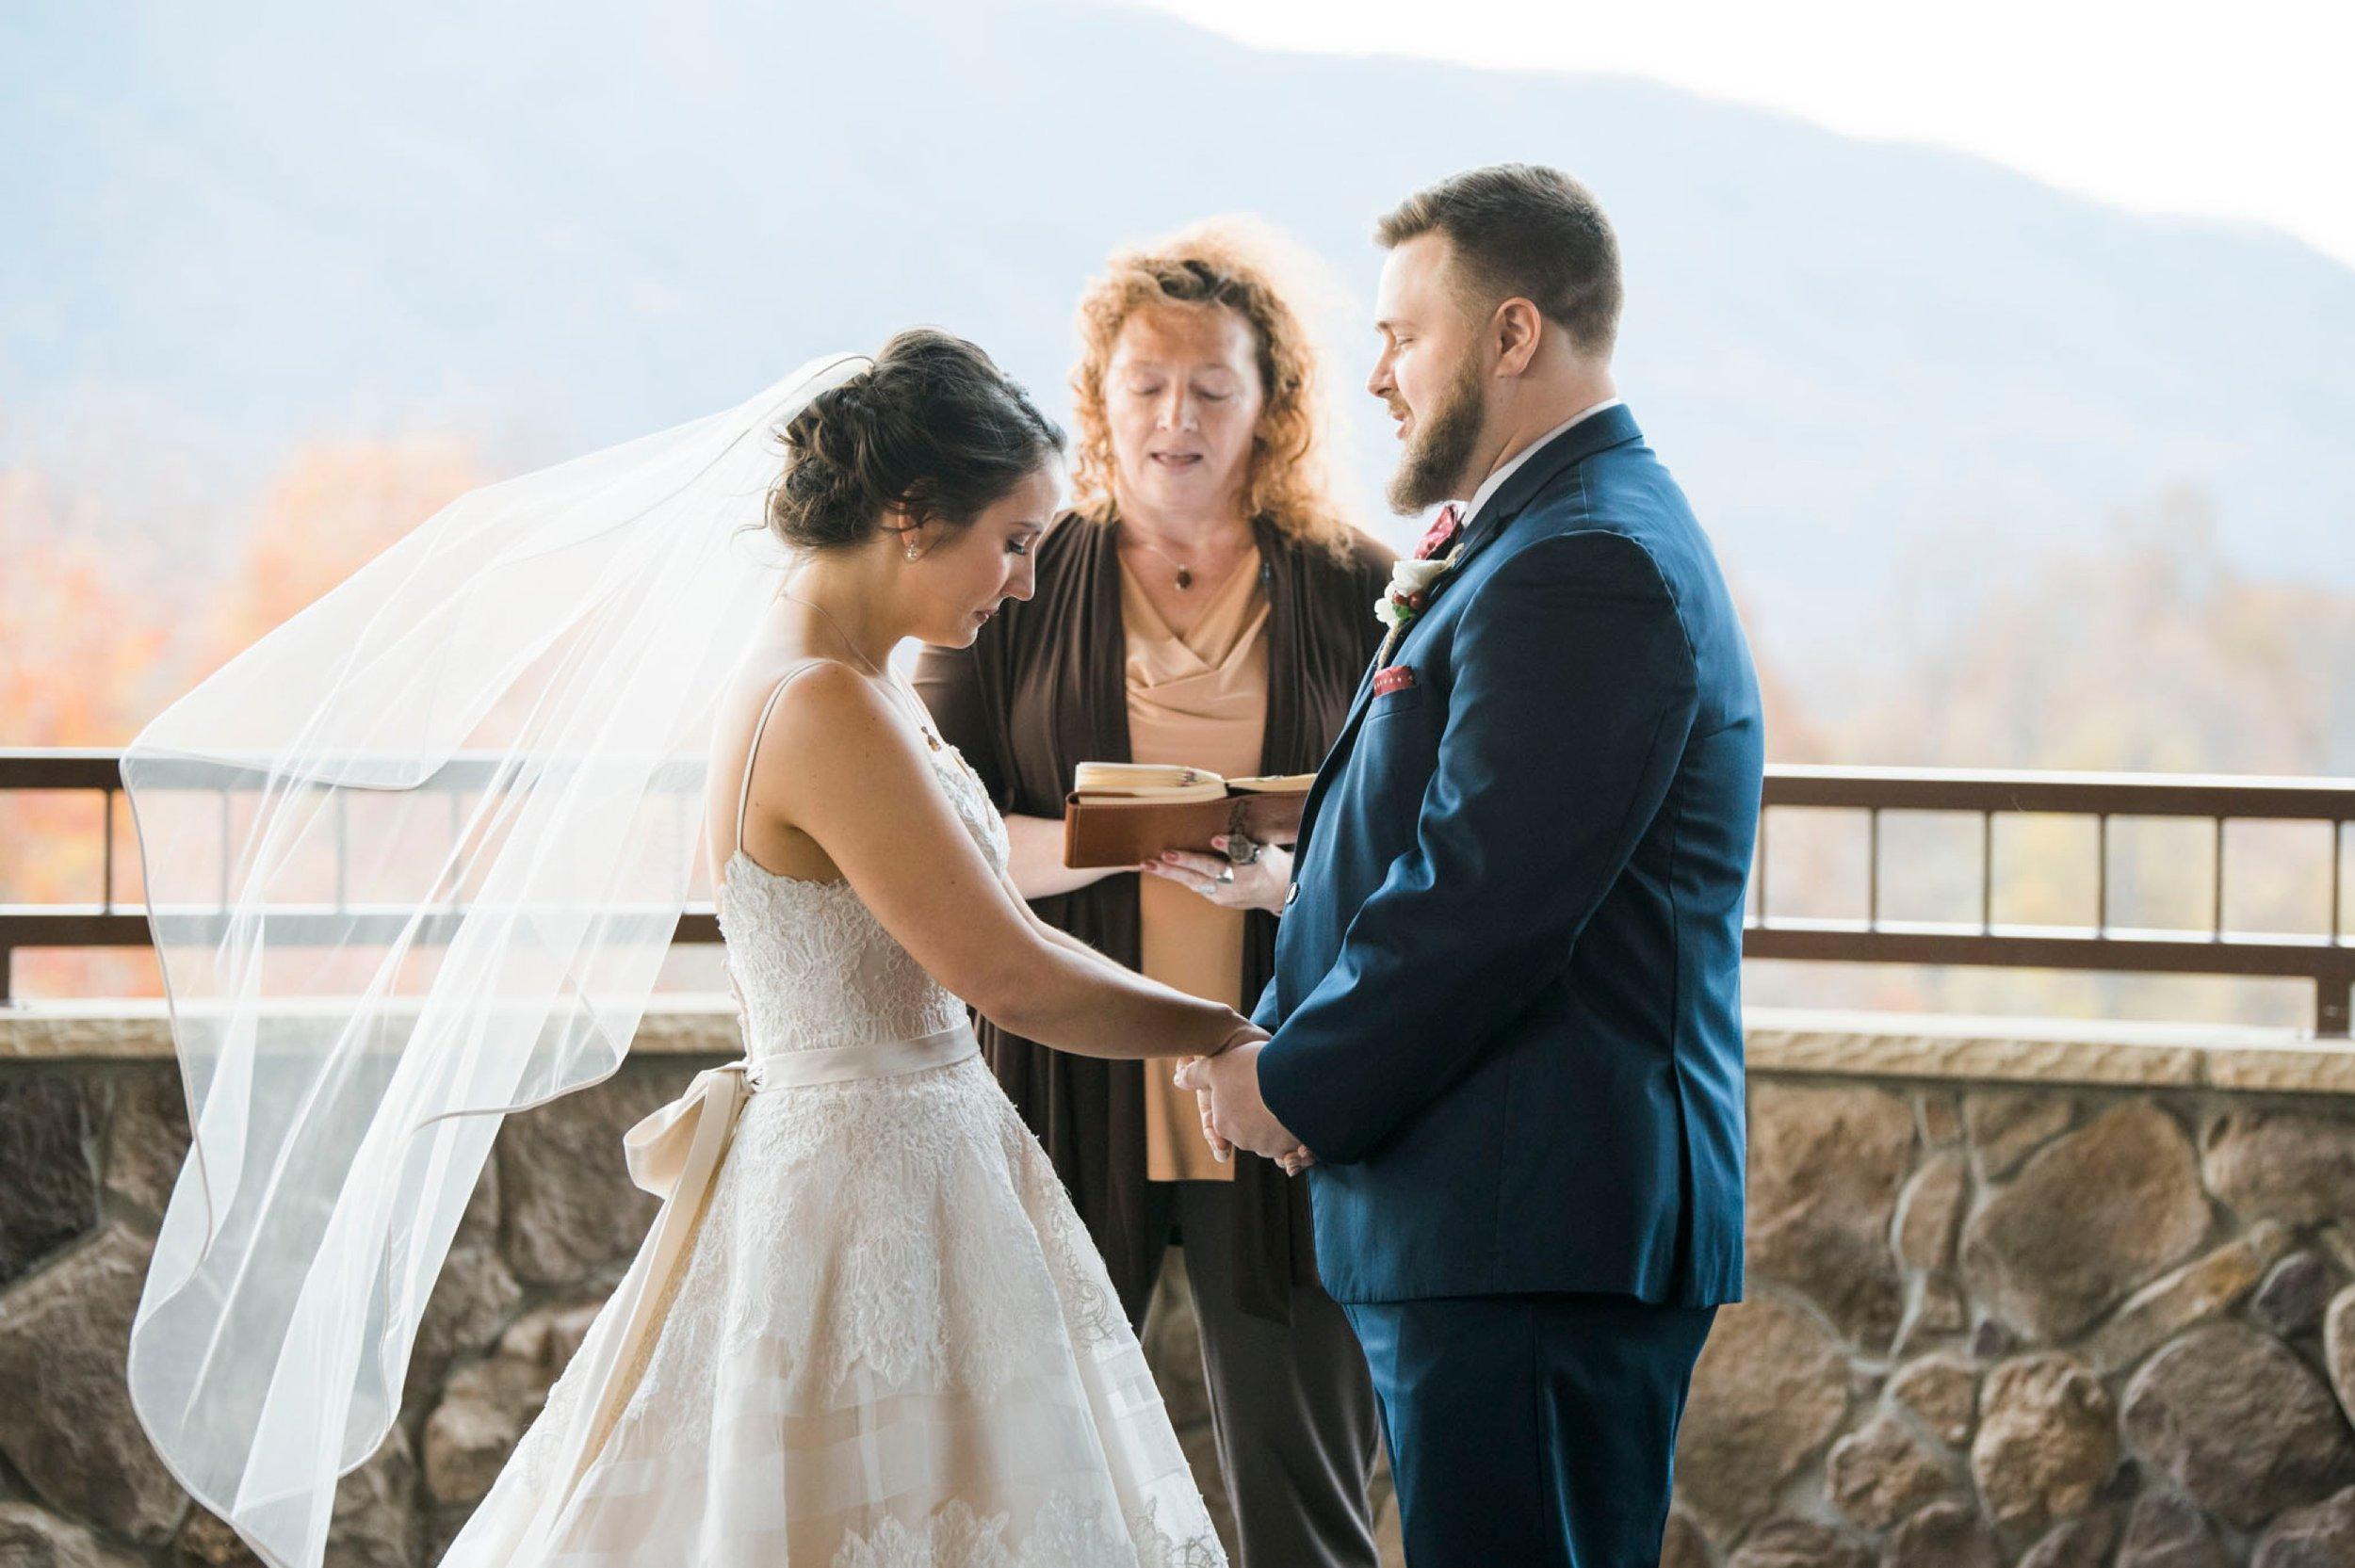 IrvineEstate_LexingtonVA_Wedding_FallWedding_VirginiaWeddingPhotographer 63.jpg